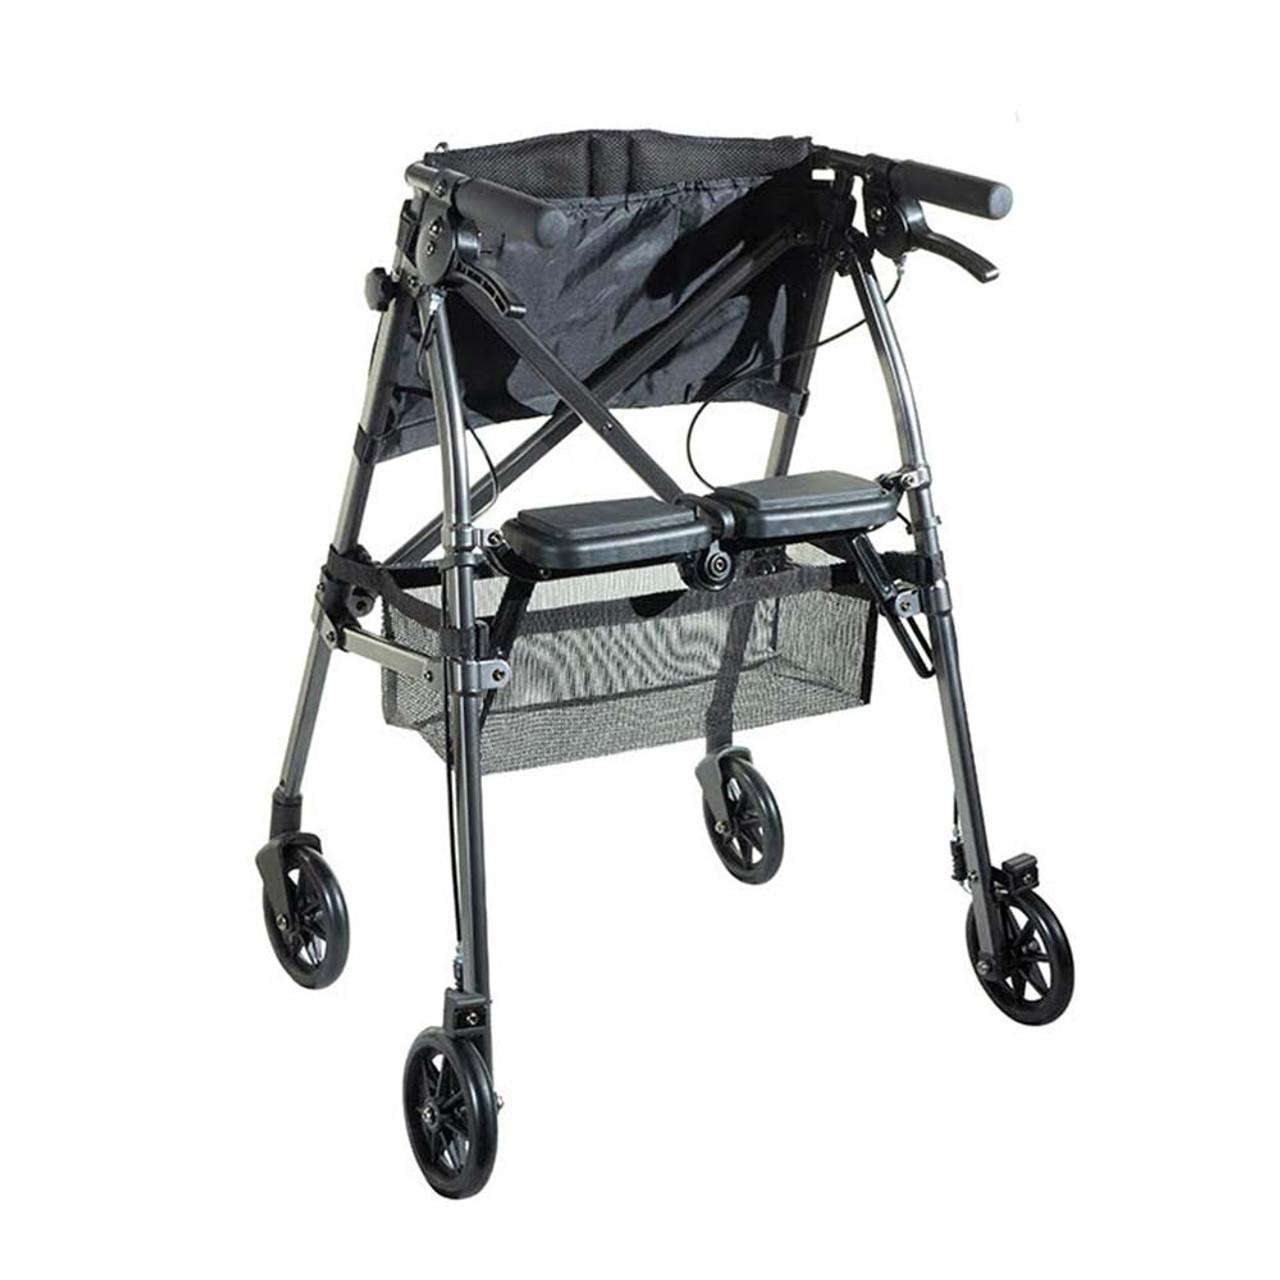 Portable Folding Mobility Walker MWPFL1  Open Back View Black